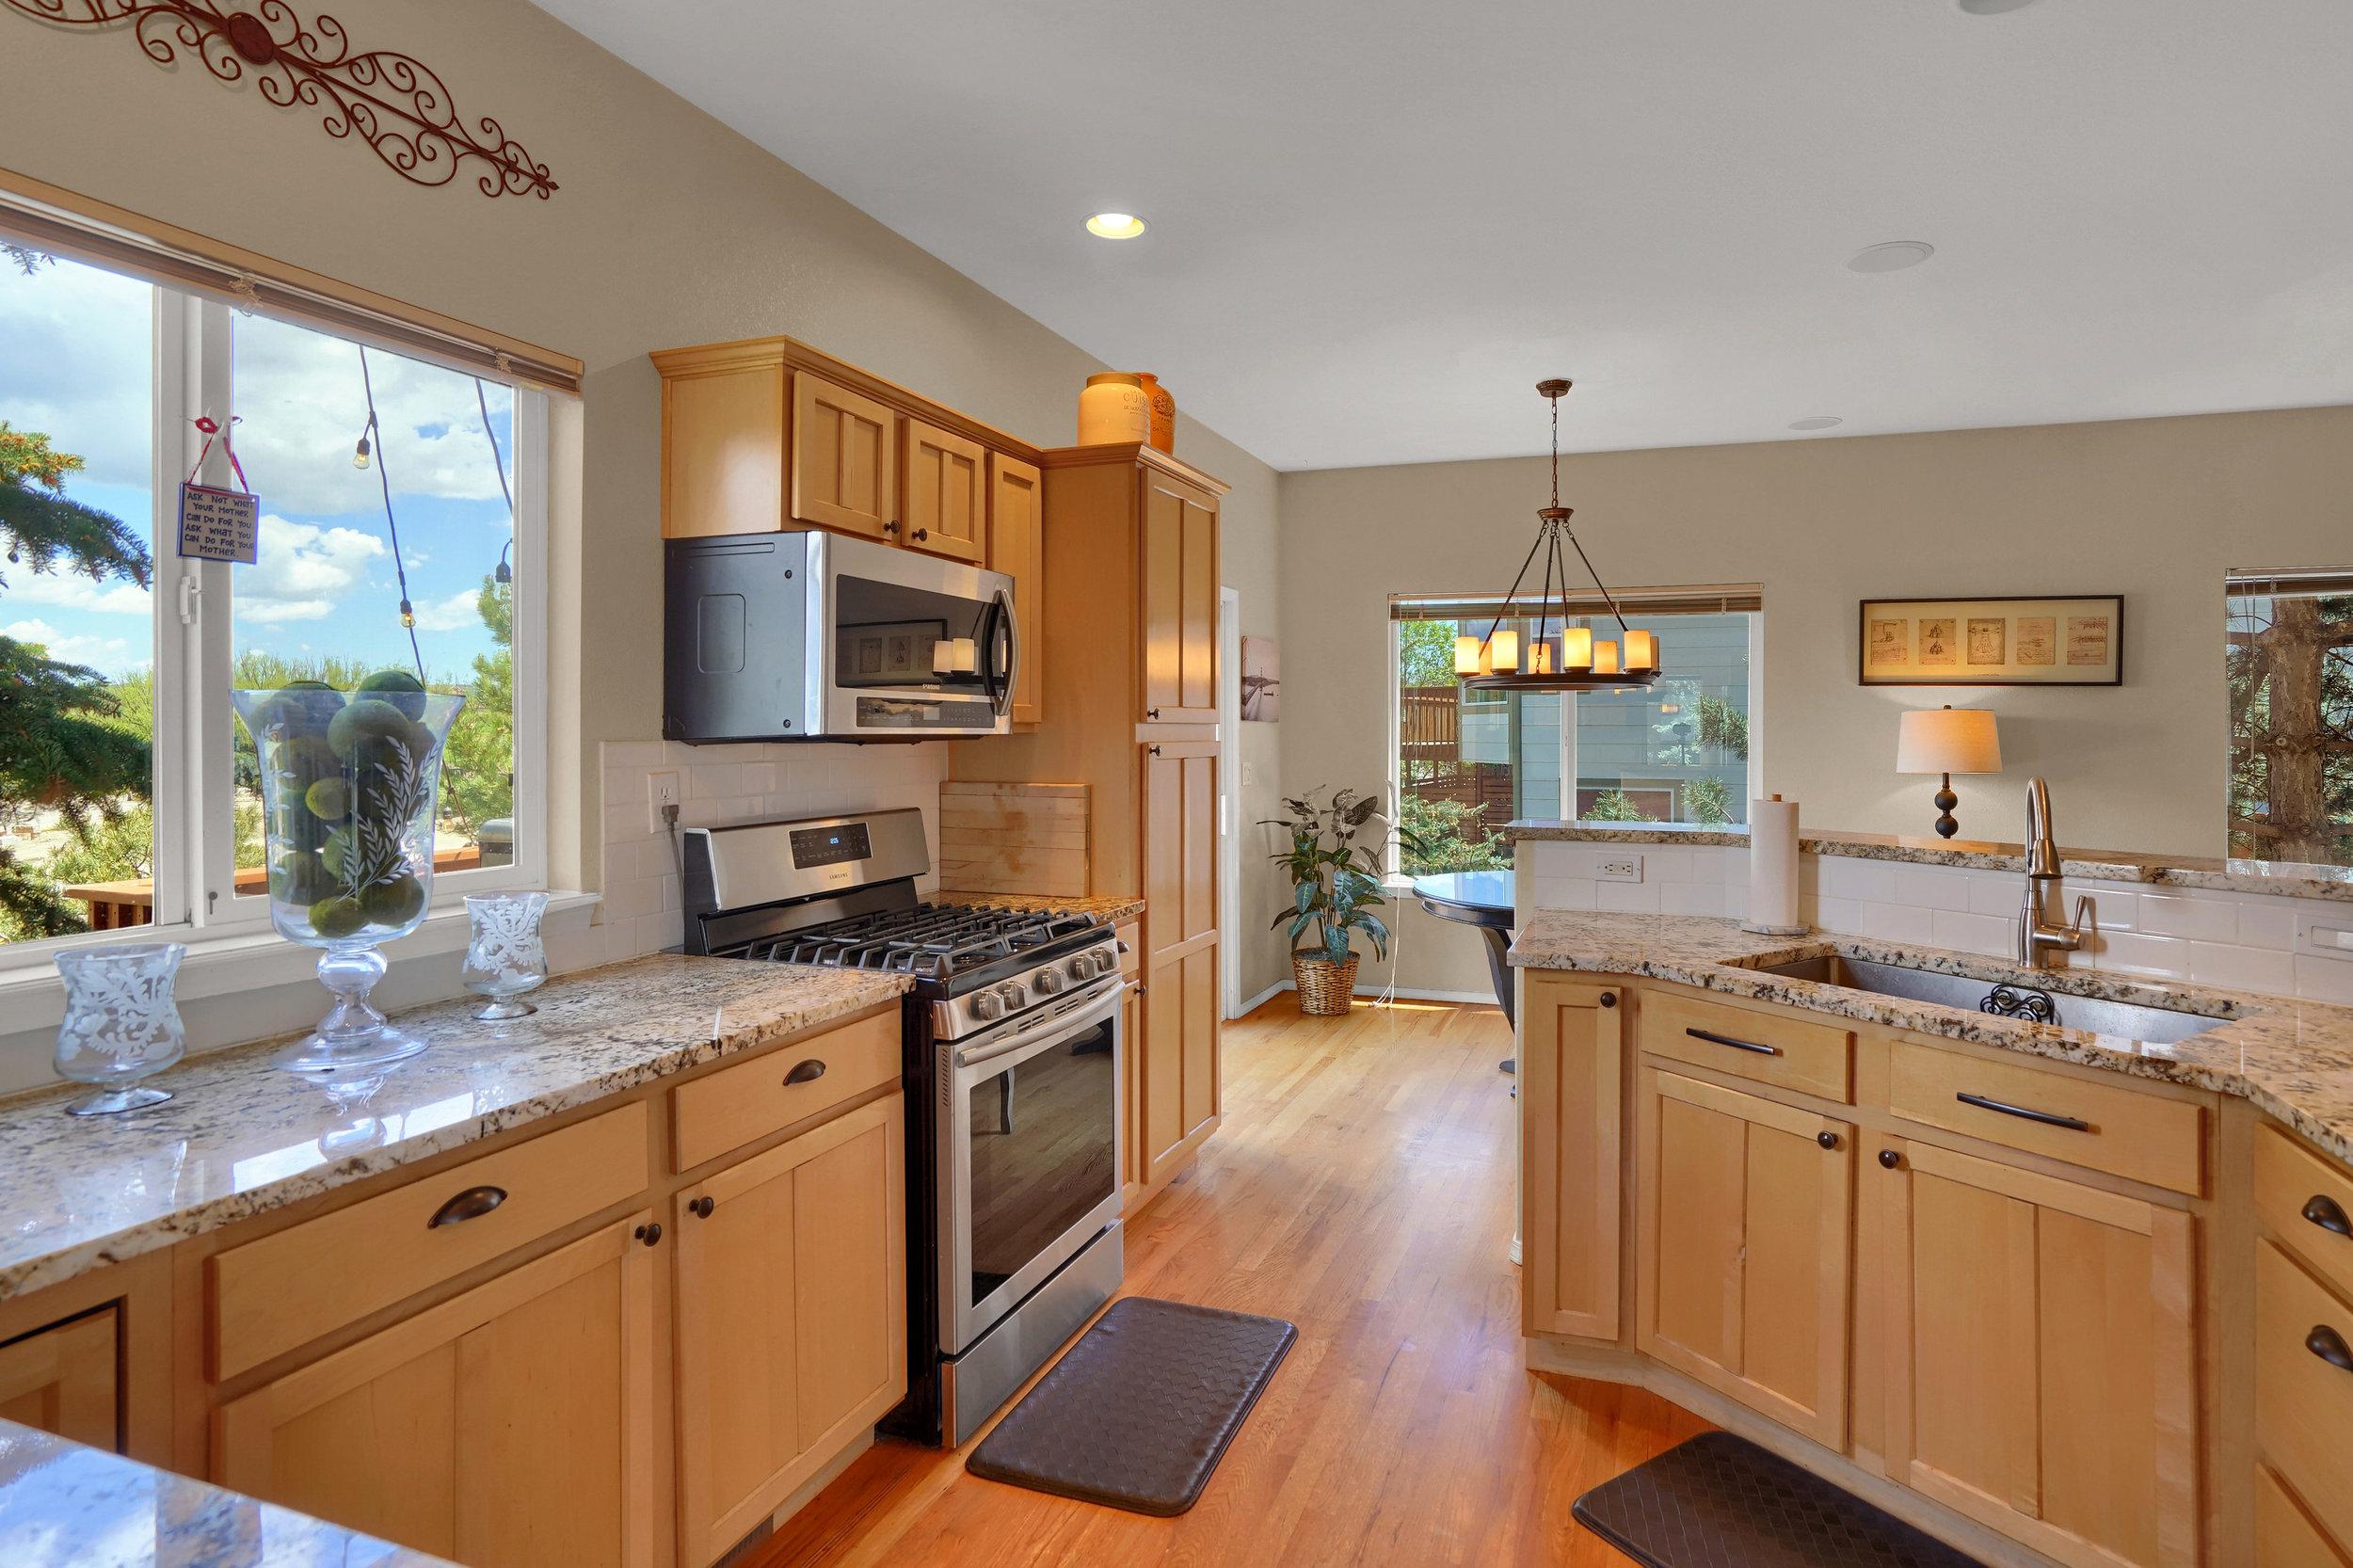 2756 Kittyhawk Road Colorado-print-005-024-Kitchen-3935x2622-300dpi.jpg